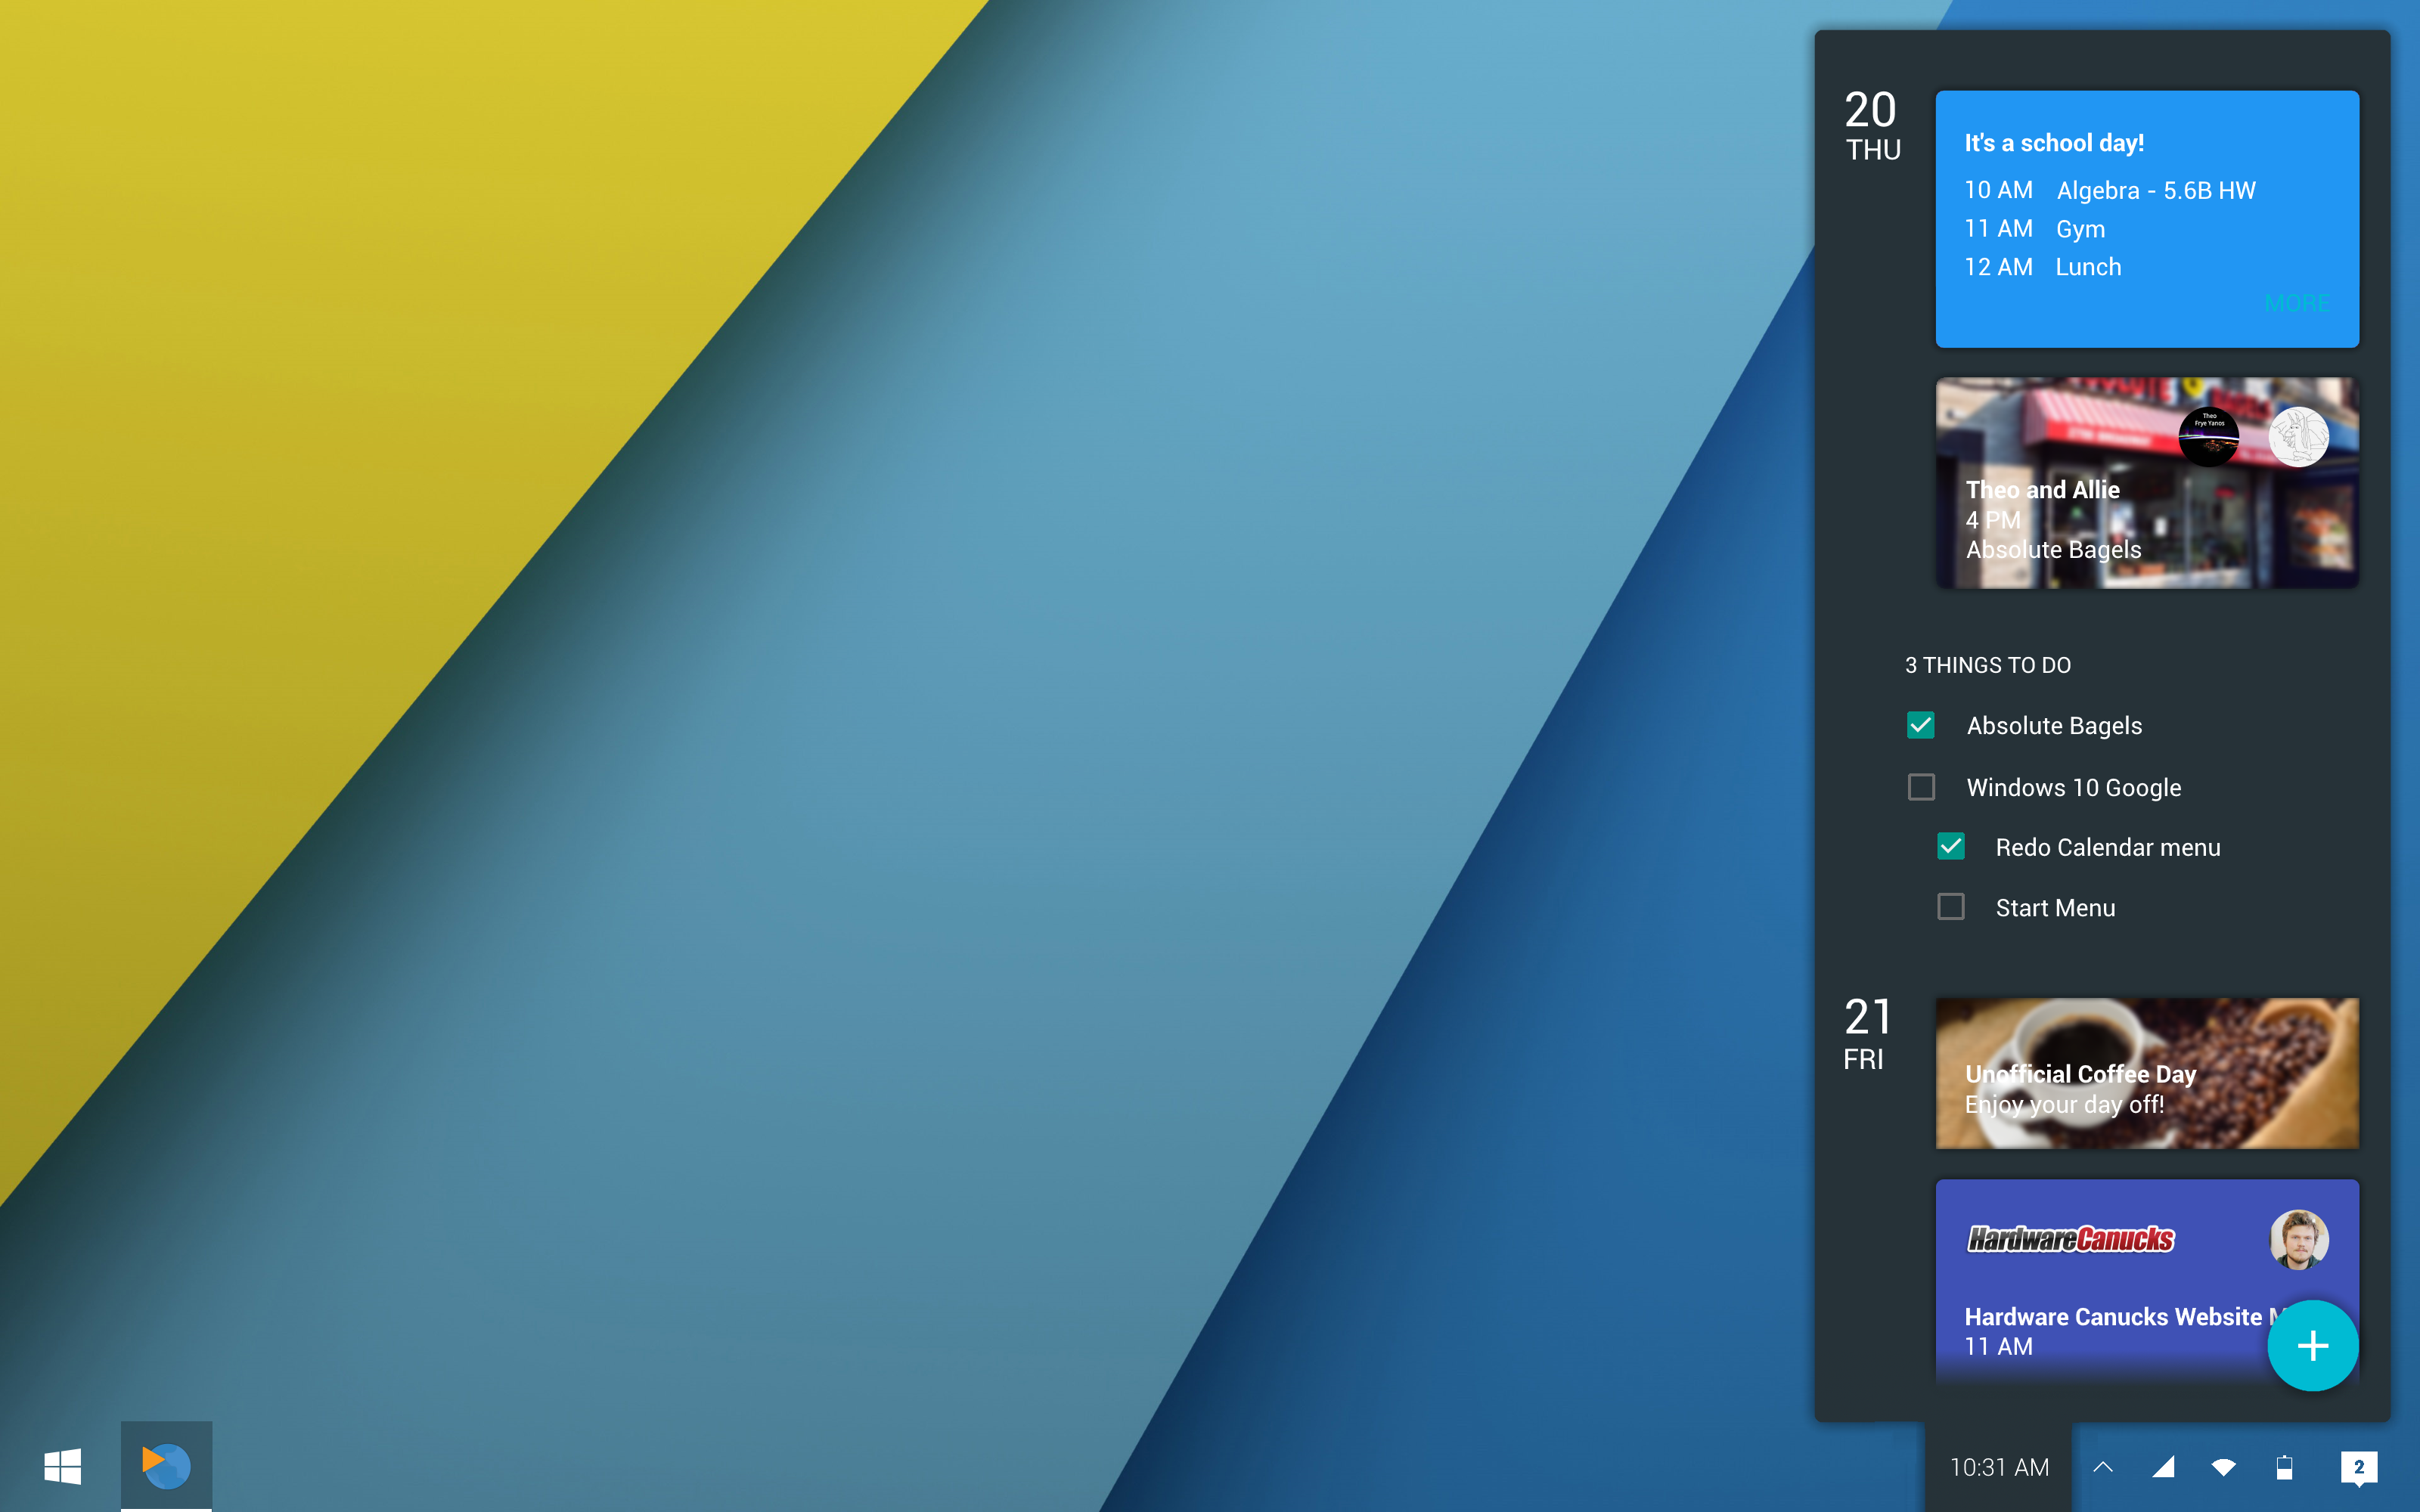 Google Calendar Art : Windows google calendar menu by wwsalmon on deviantart